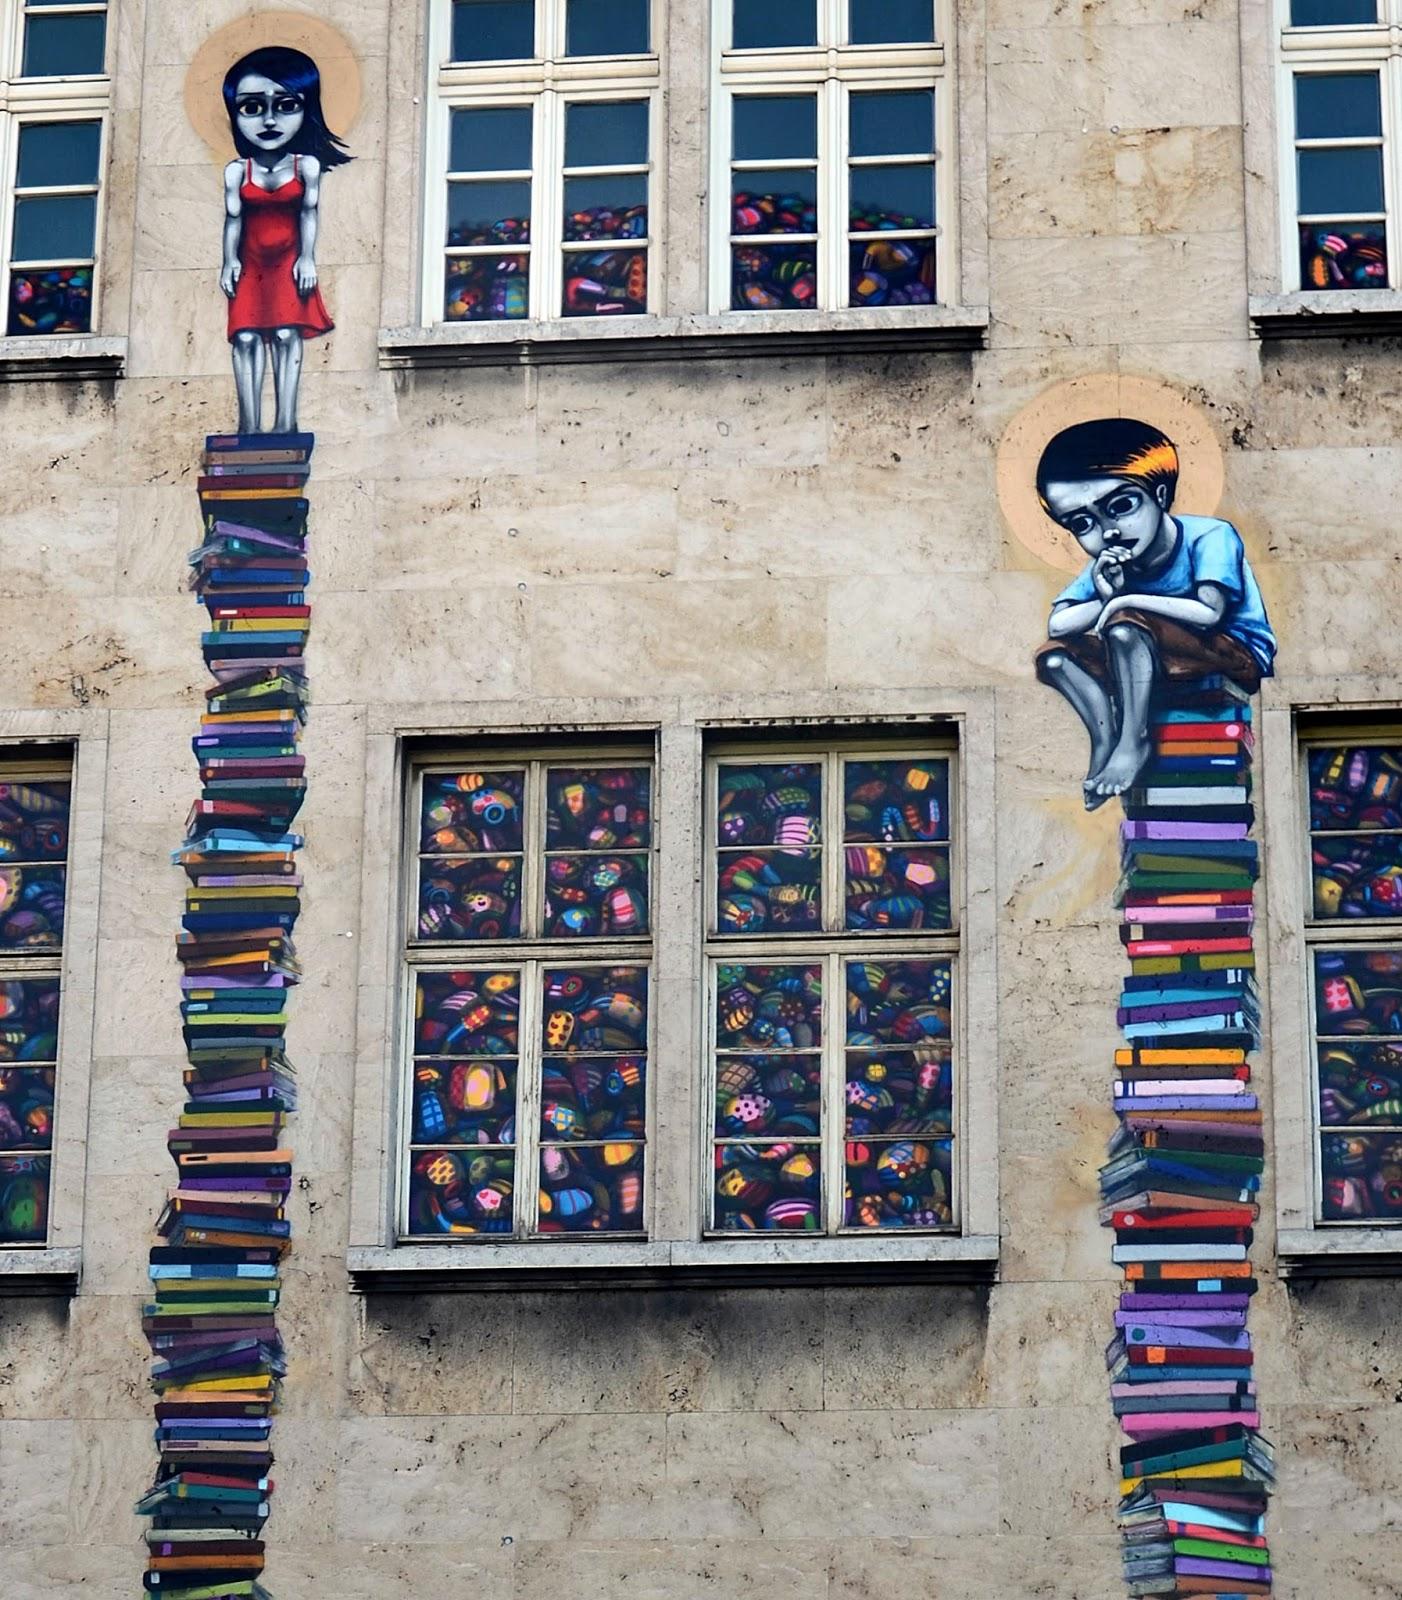 Tinho New Mural In Frankfurt, Germany | StreetArtNews ...